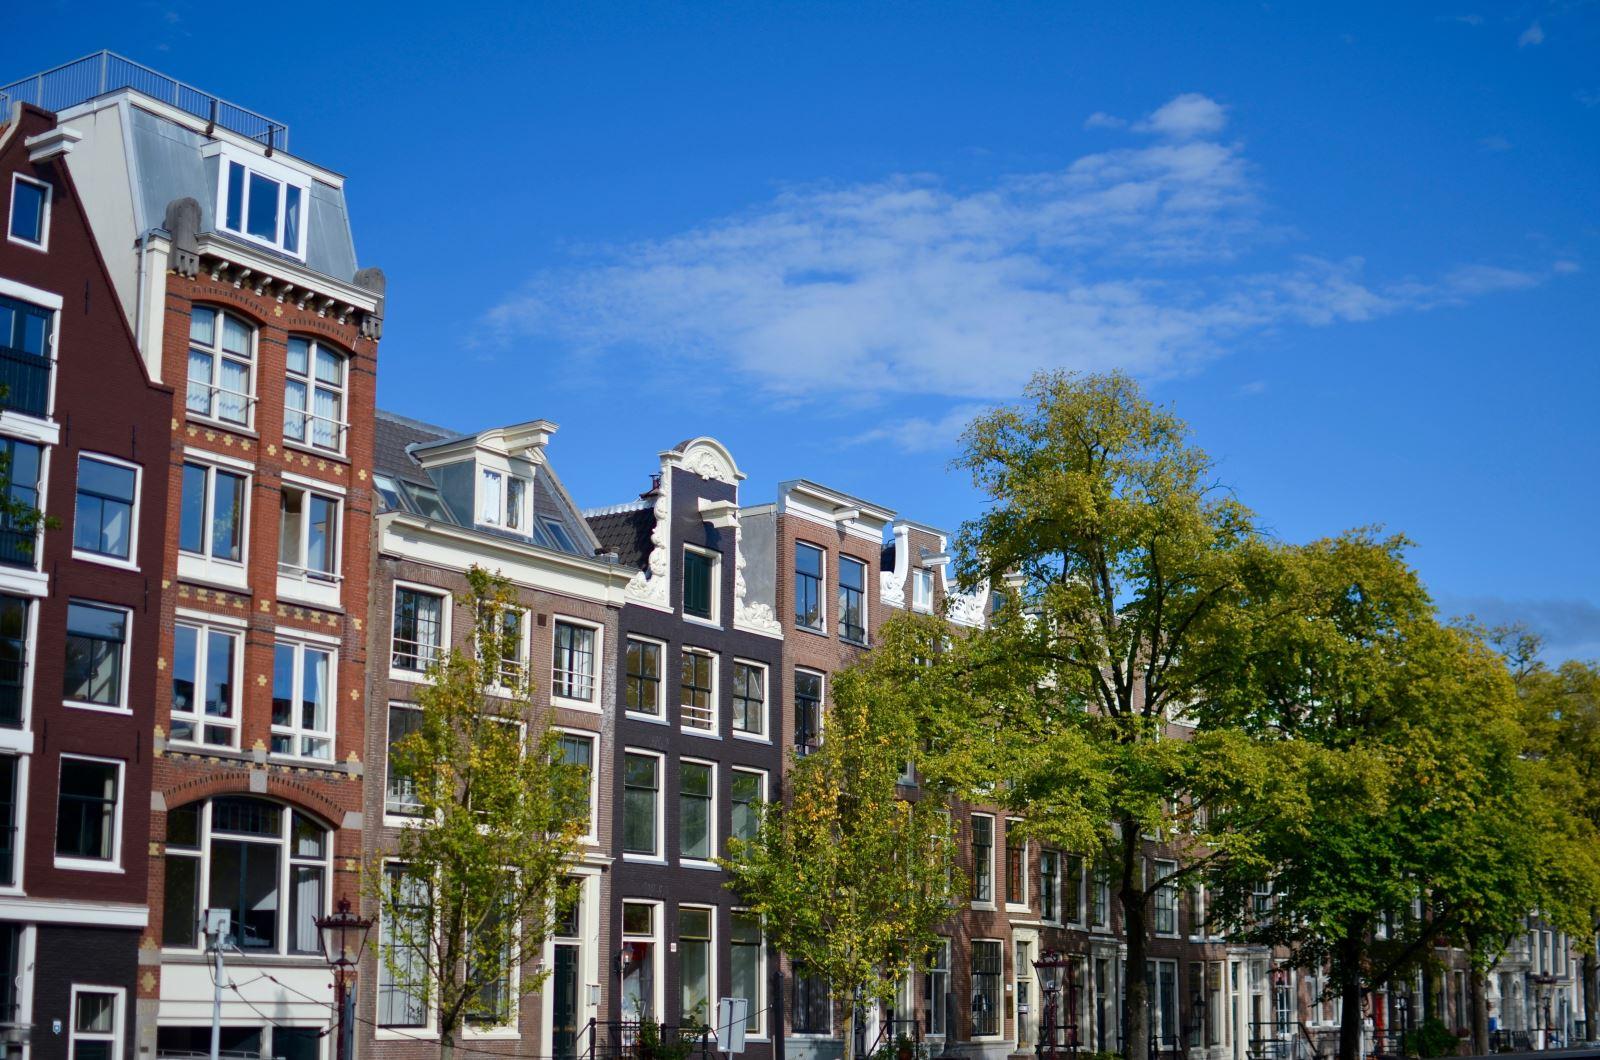 Huis verhuren in Amsterdam | VHM Makelaars Amsterdam